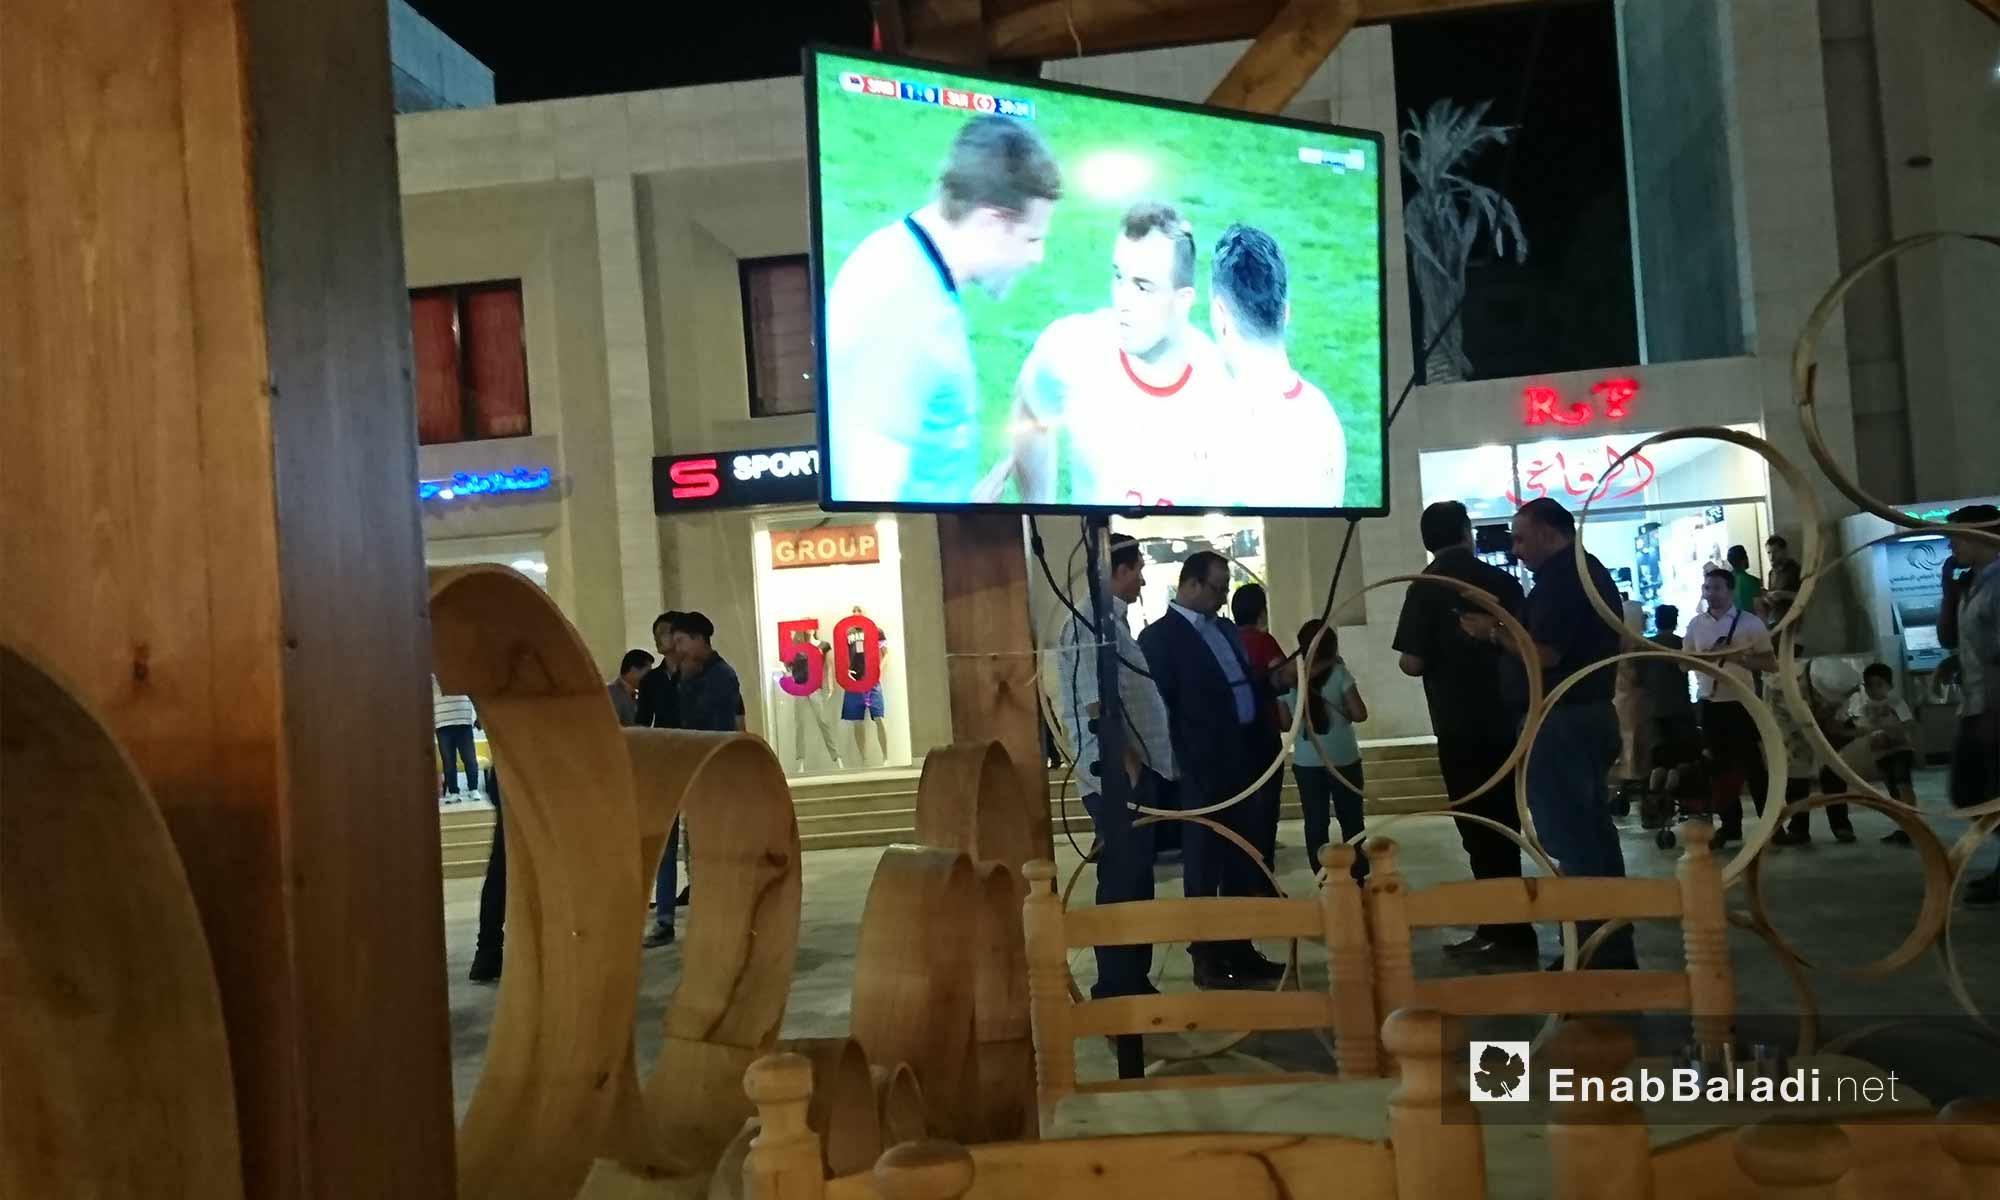 World Cup match at the Uptown Center in Mashrou Dummar, Damascus – June 22, 2018 (Enab Baladi)